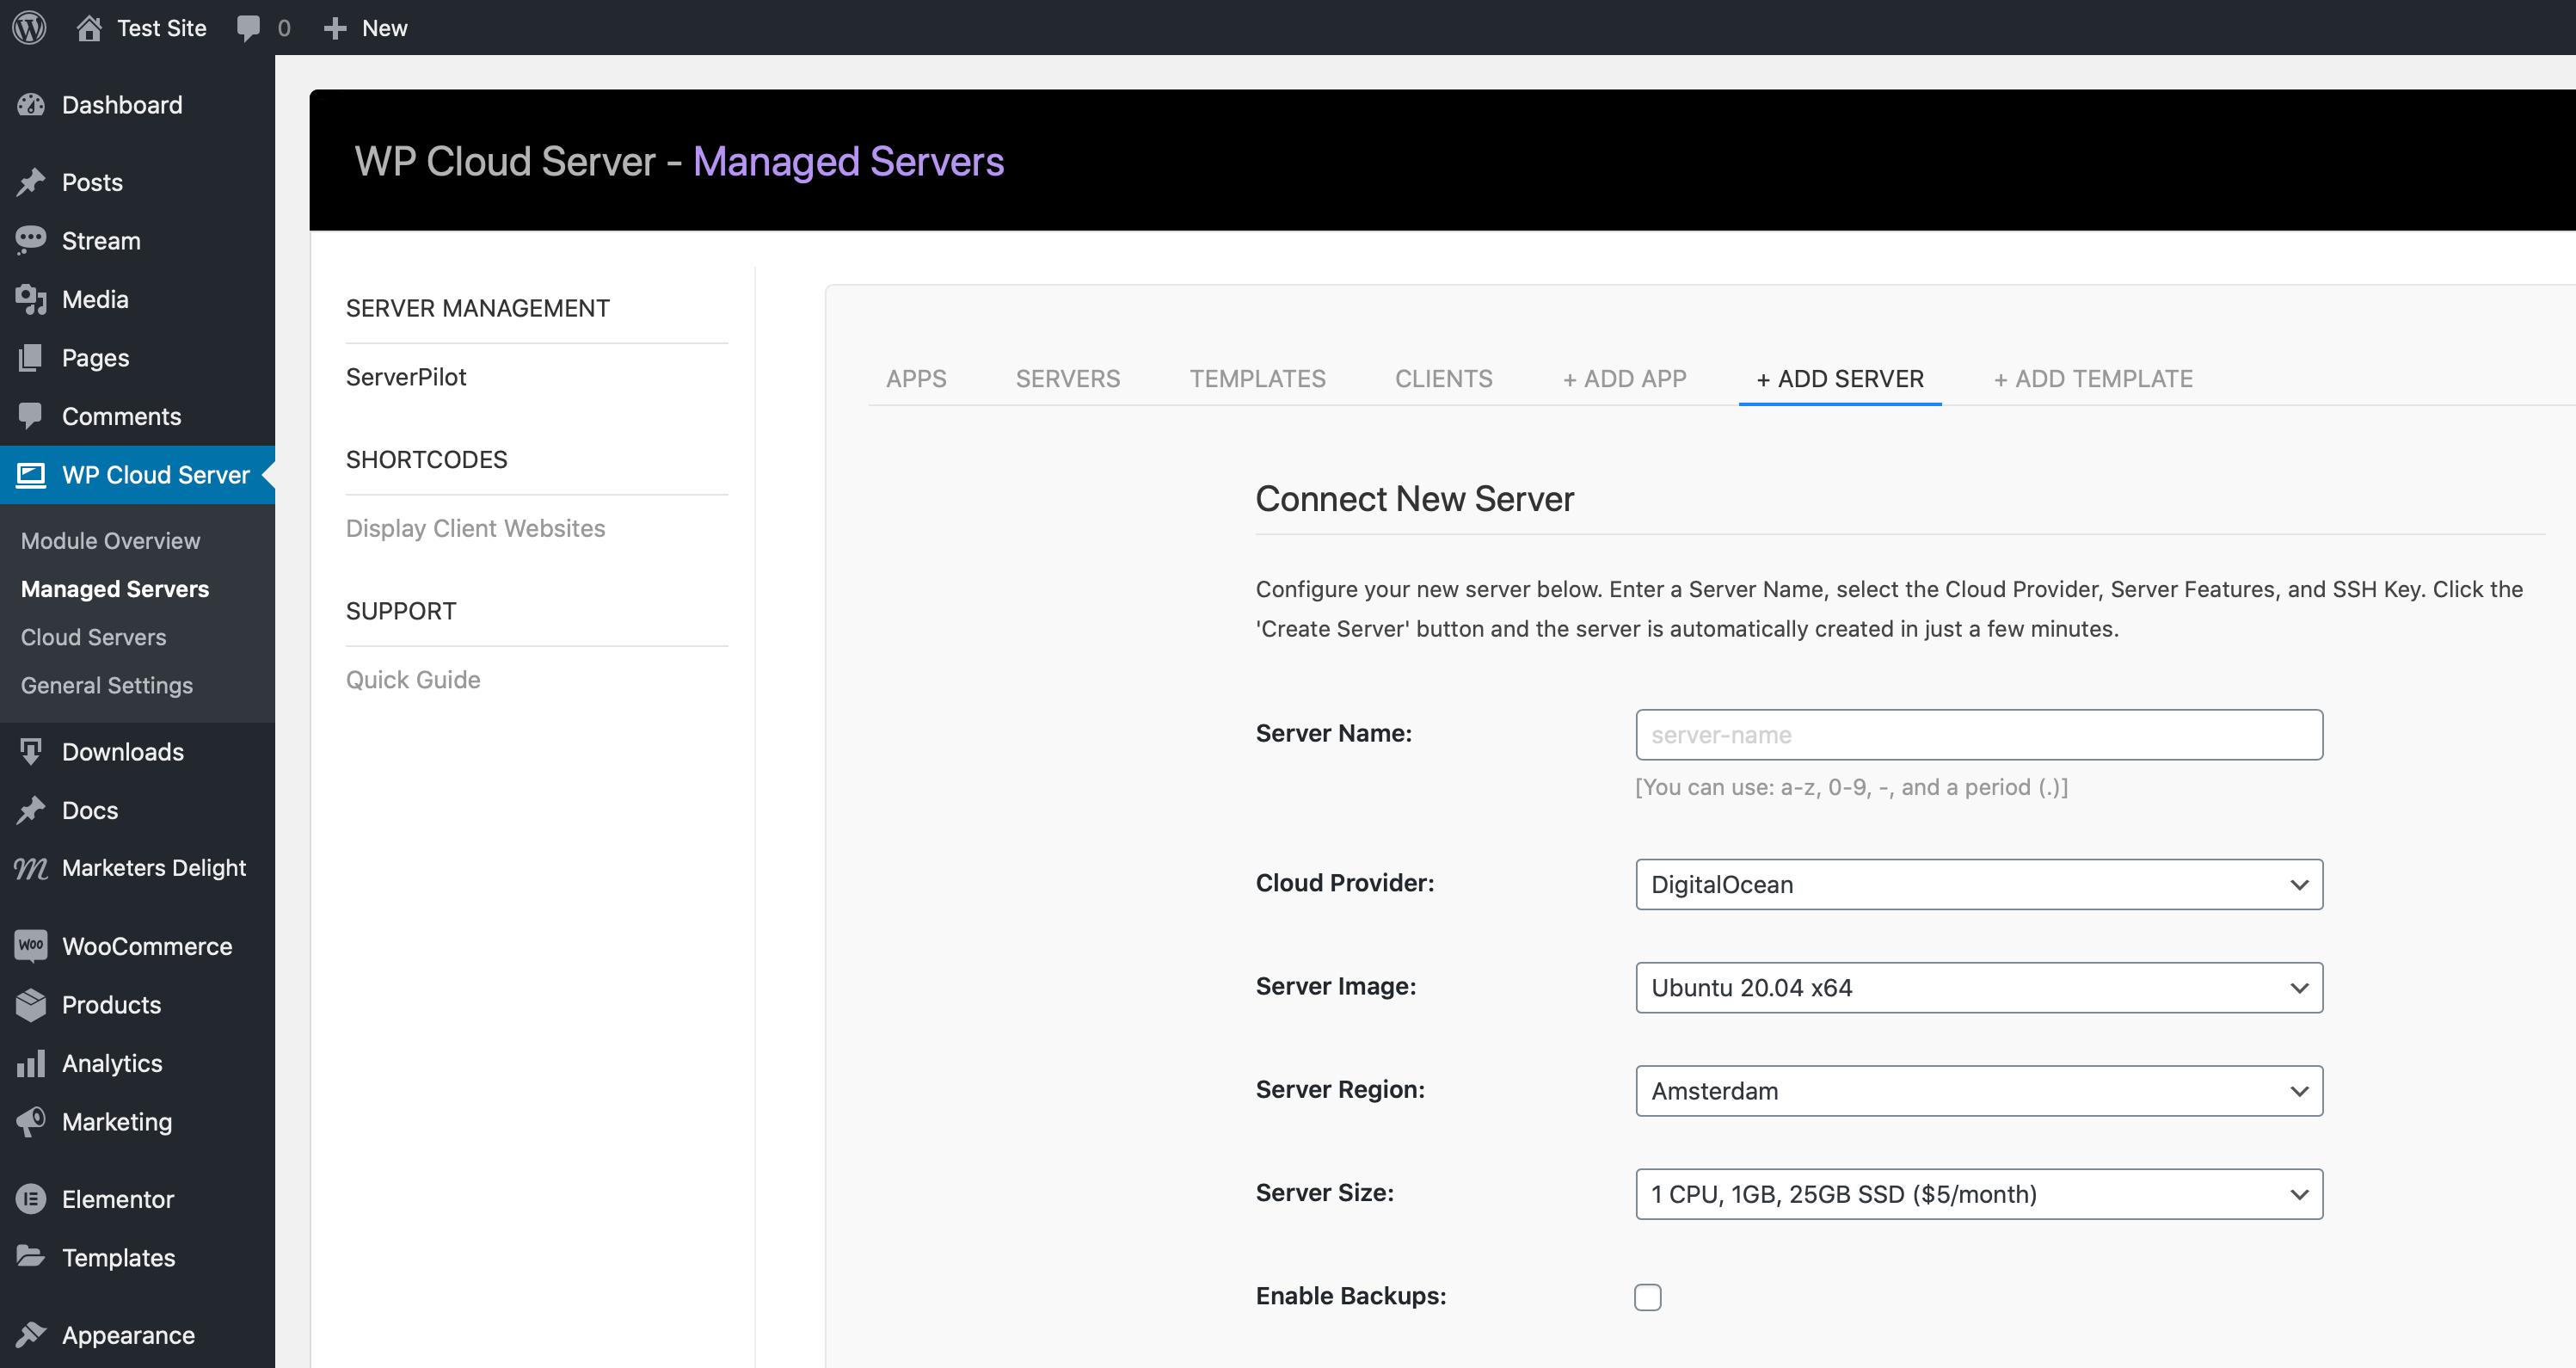 Add Server to ServerPilot